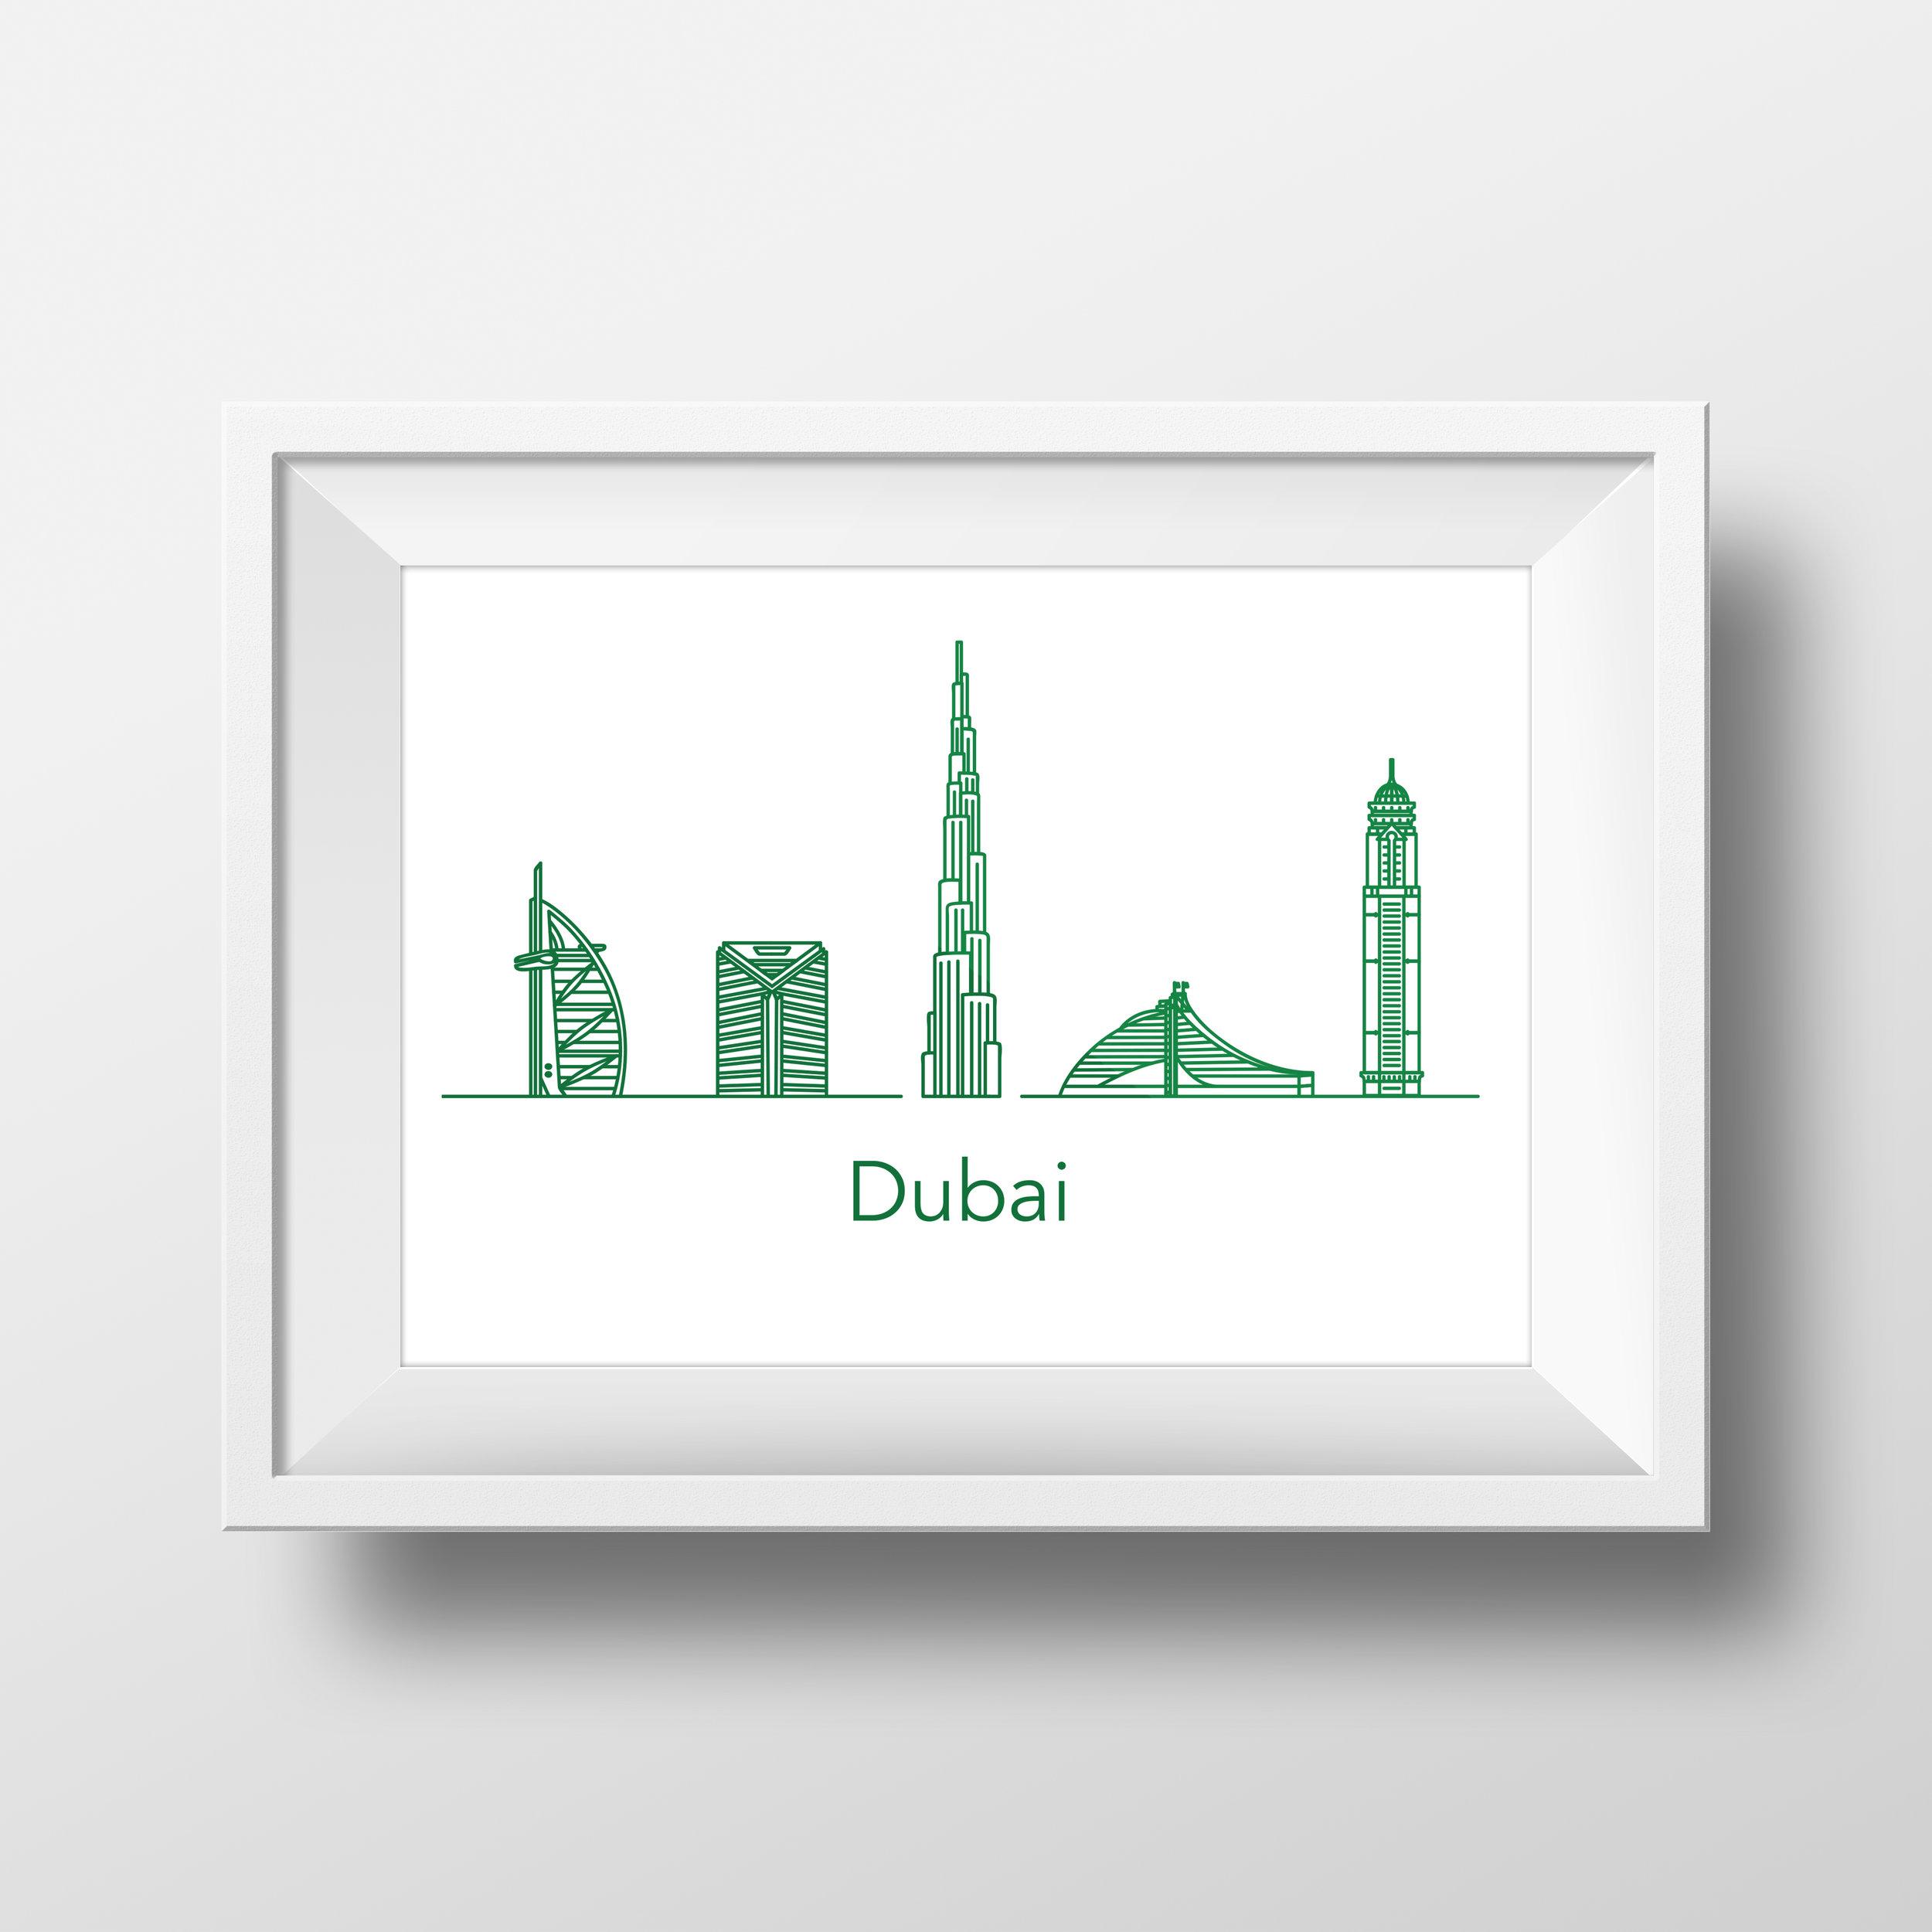 Aladdin_AveoWaterBottle_Dubai_01-Mocks-Up-Frame-Hbd-copy.jpg